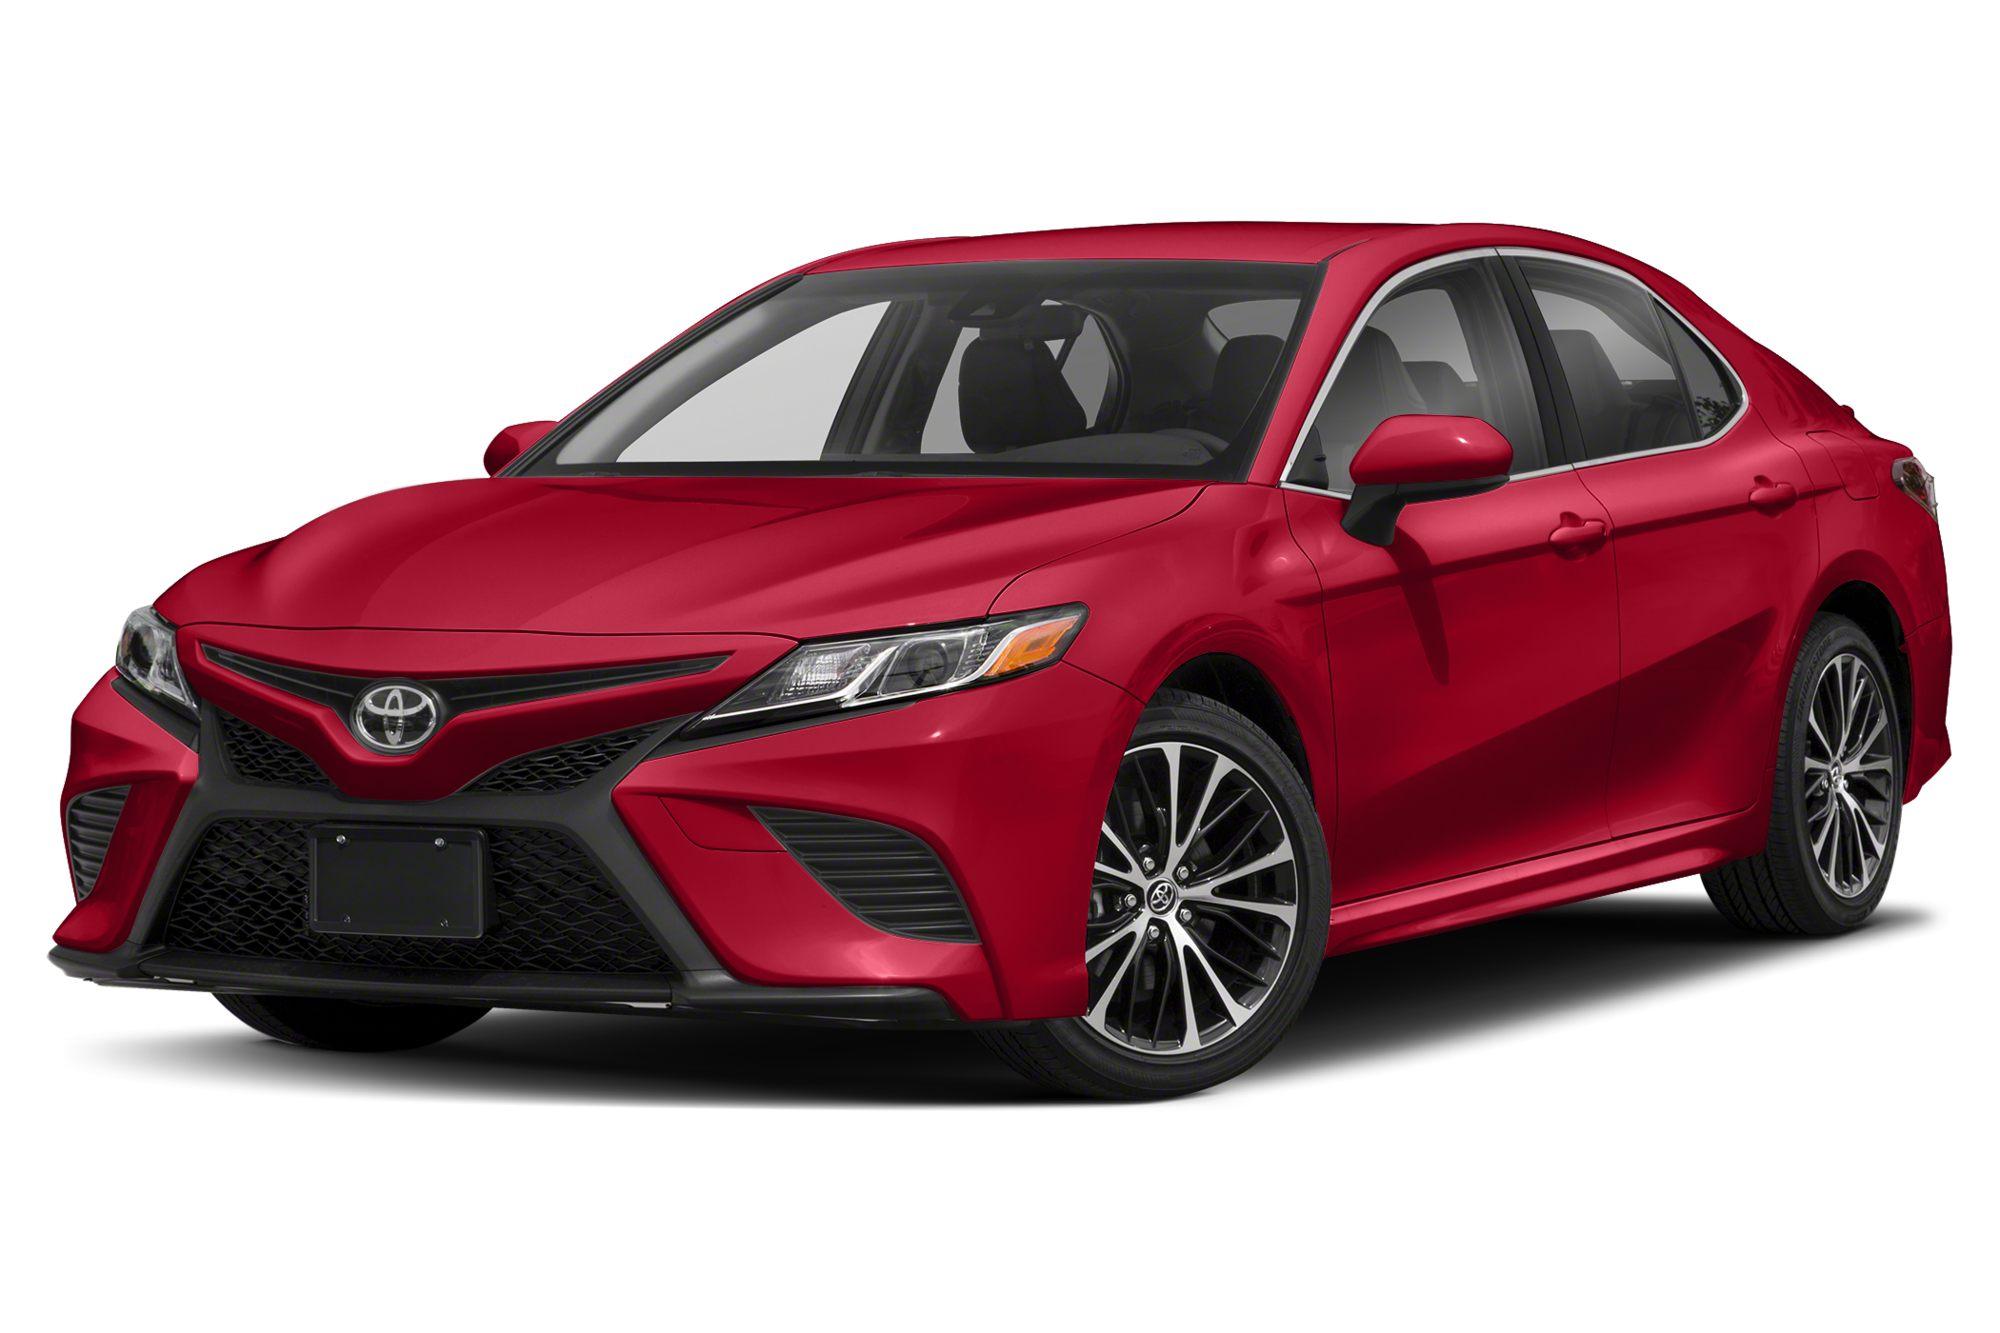 2019 Toyota Camry: Recall Alert